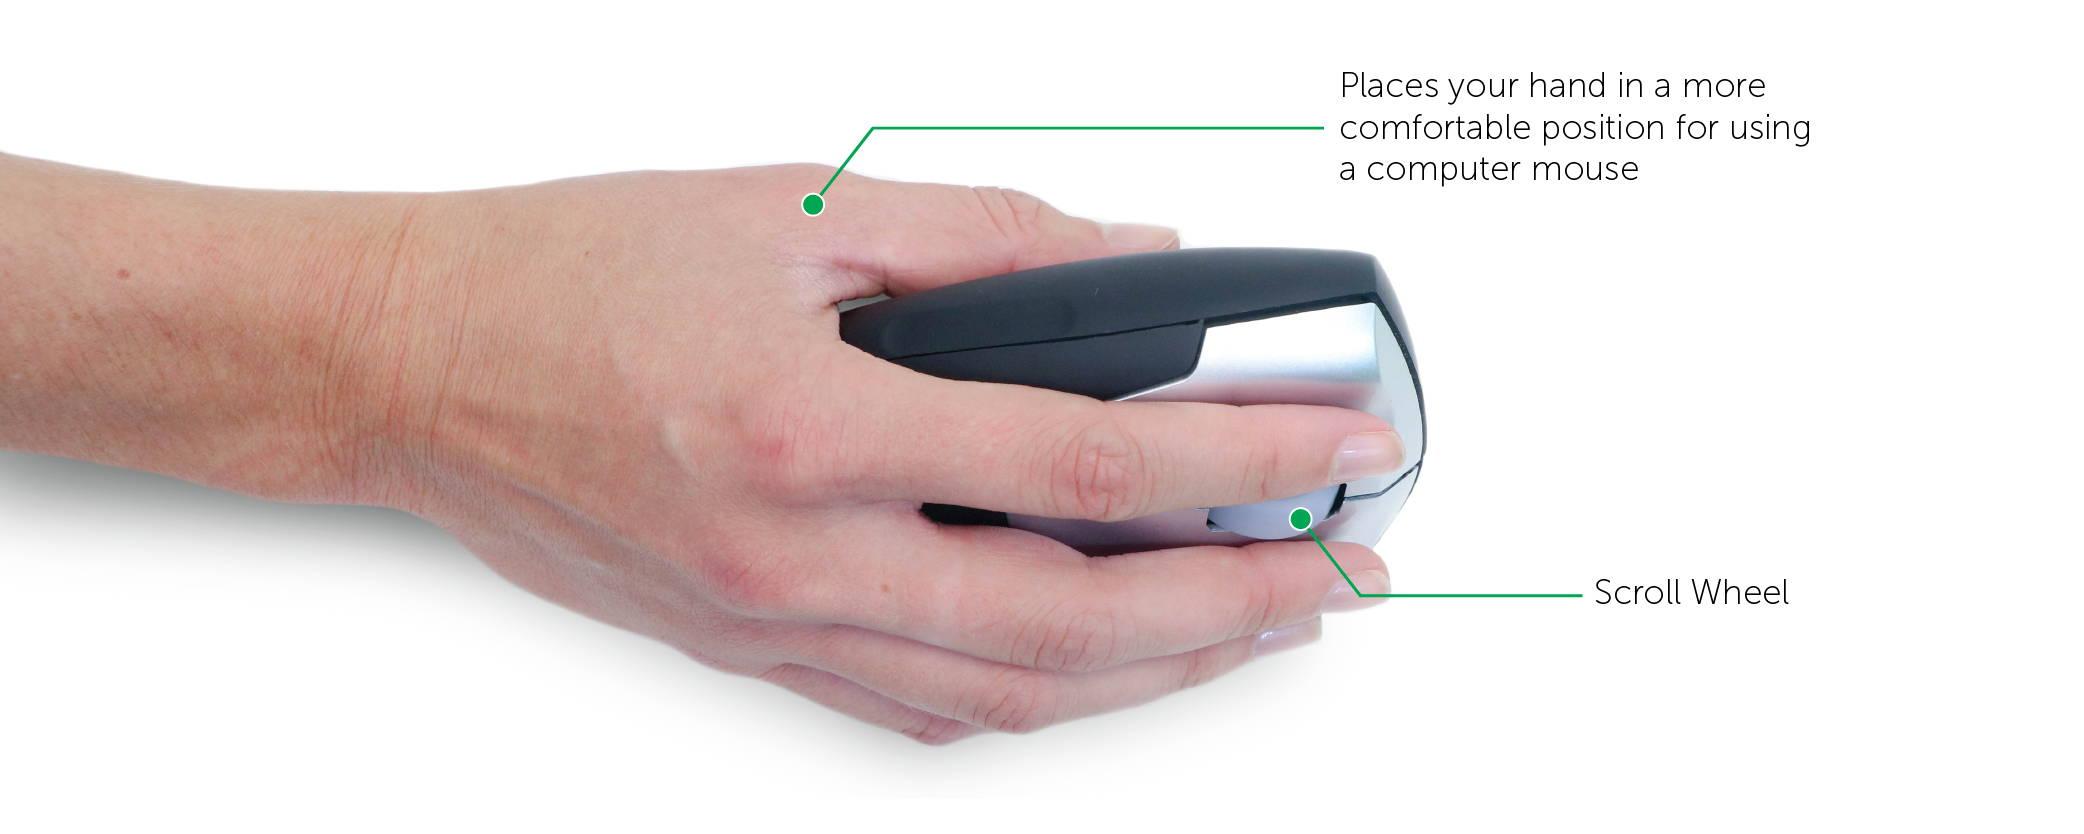 Ergonomic Mouse for wrist pain